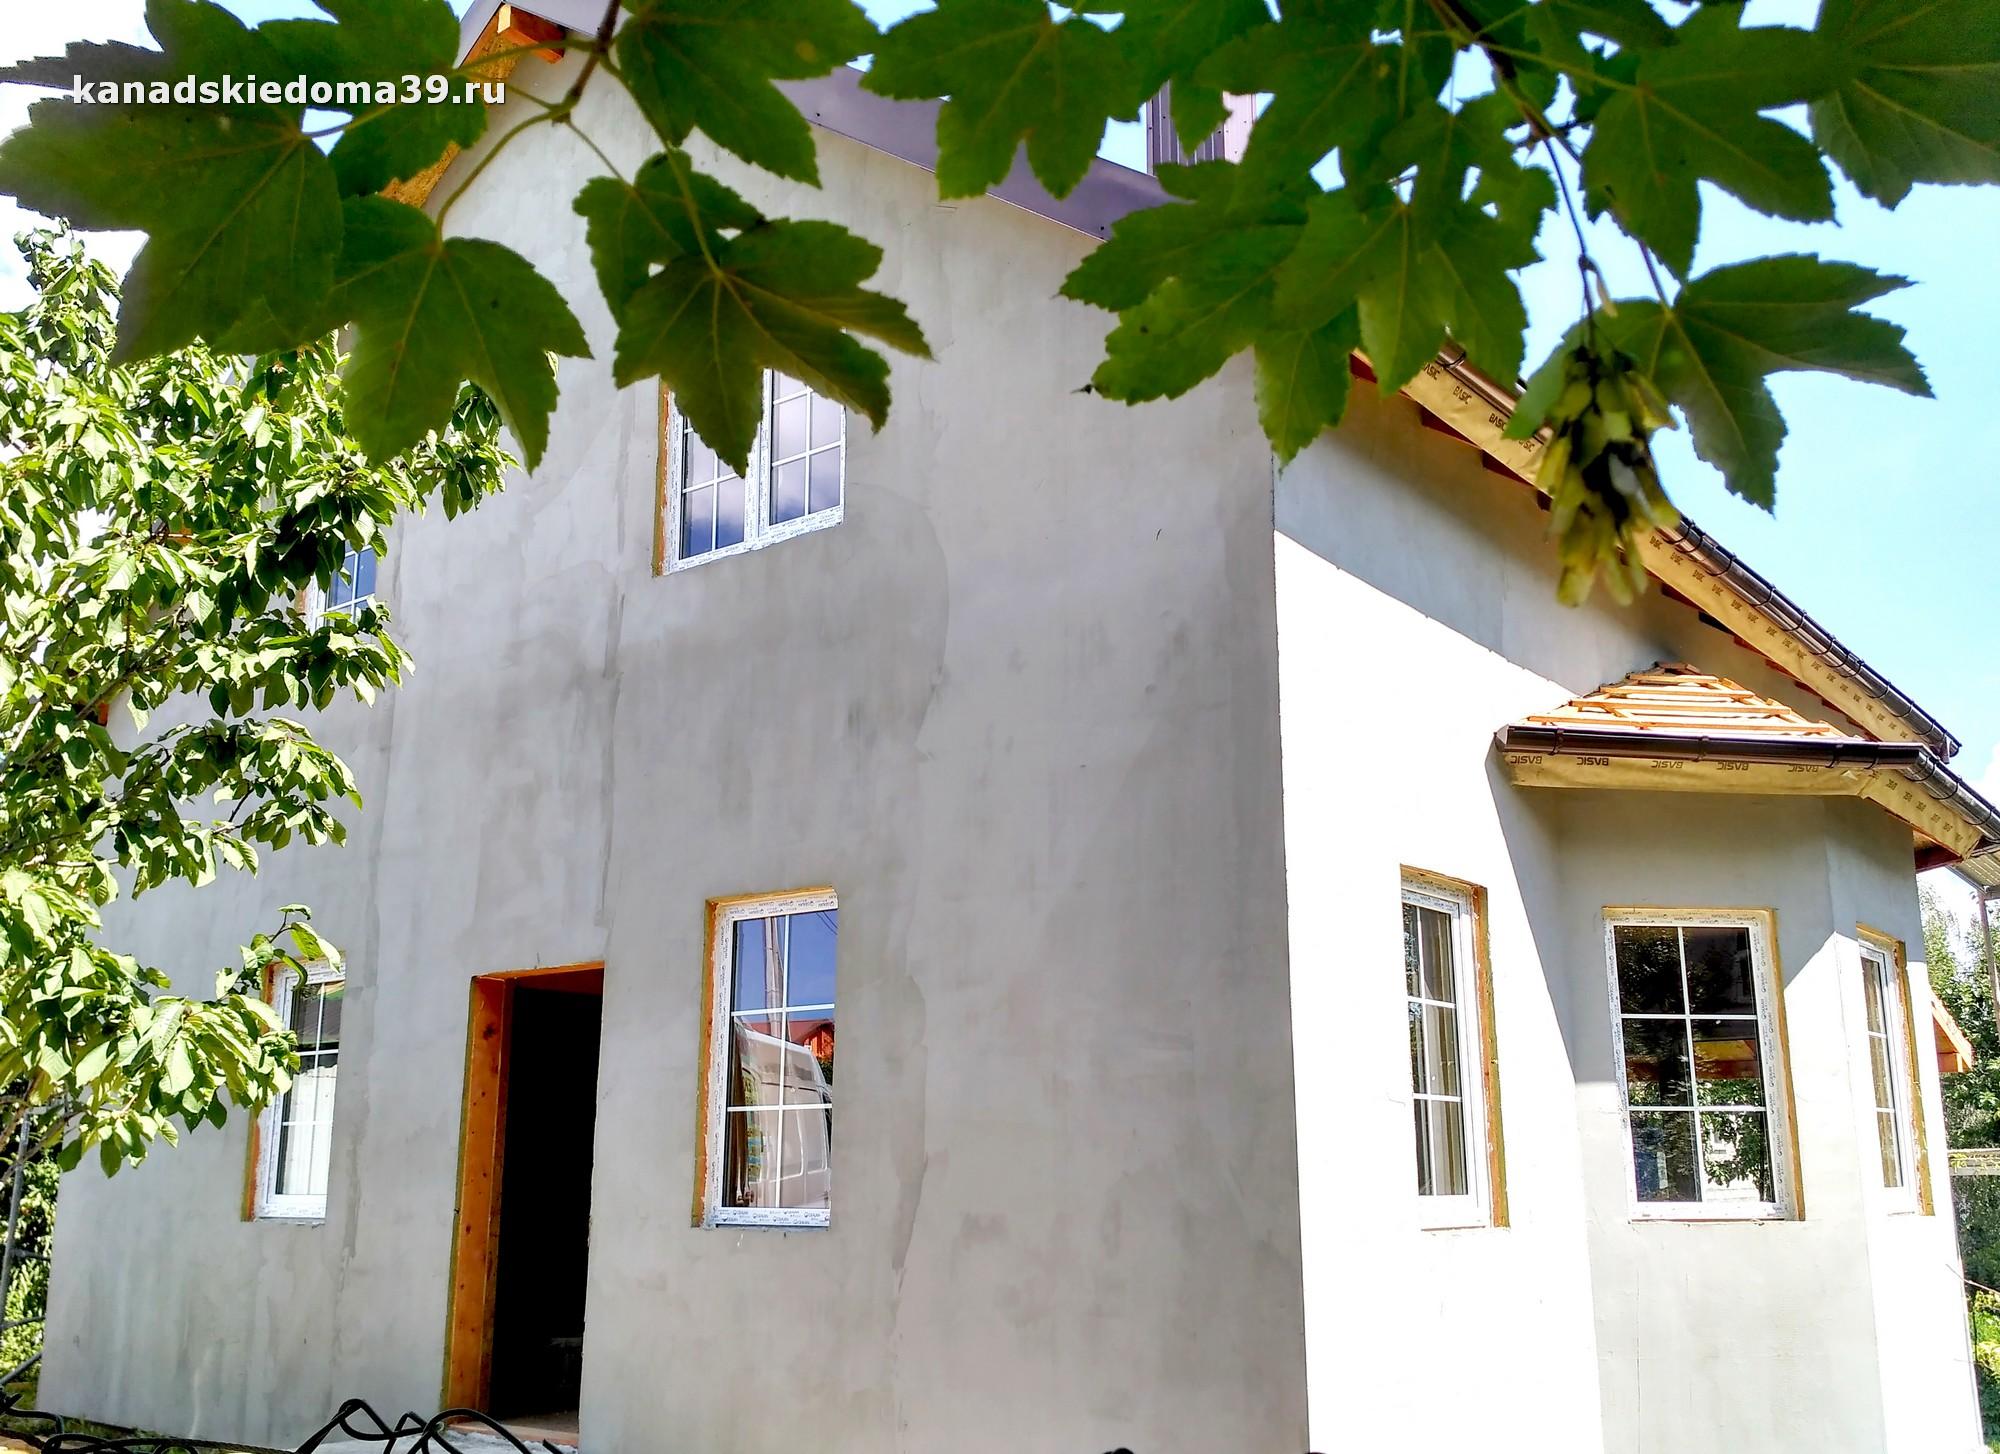 kd-sip-dom-baltiysk00059